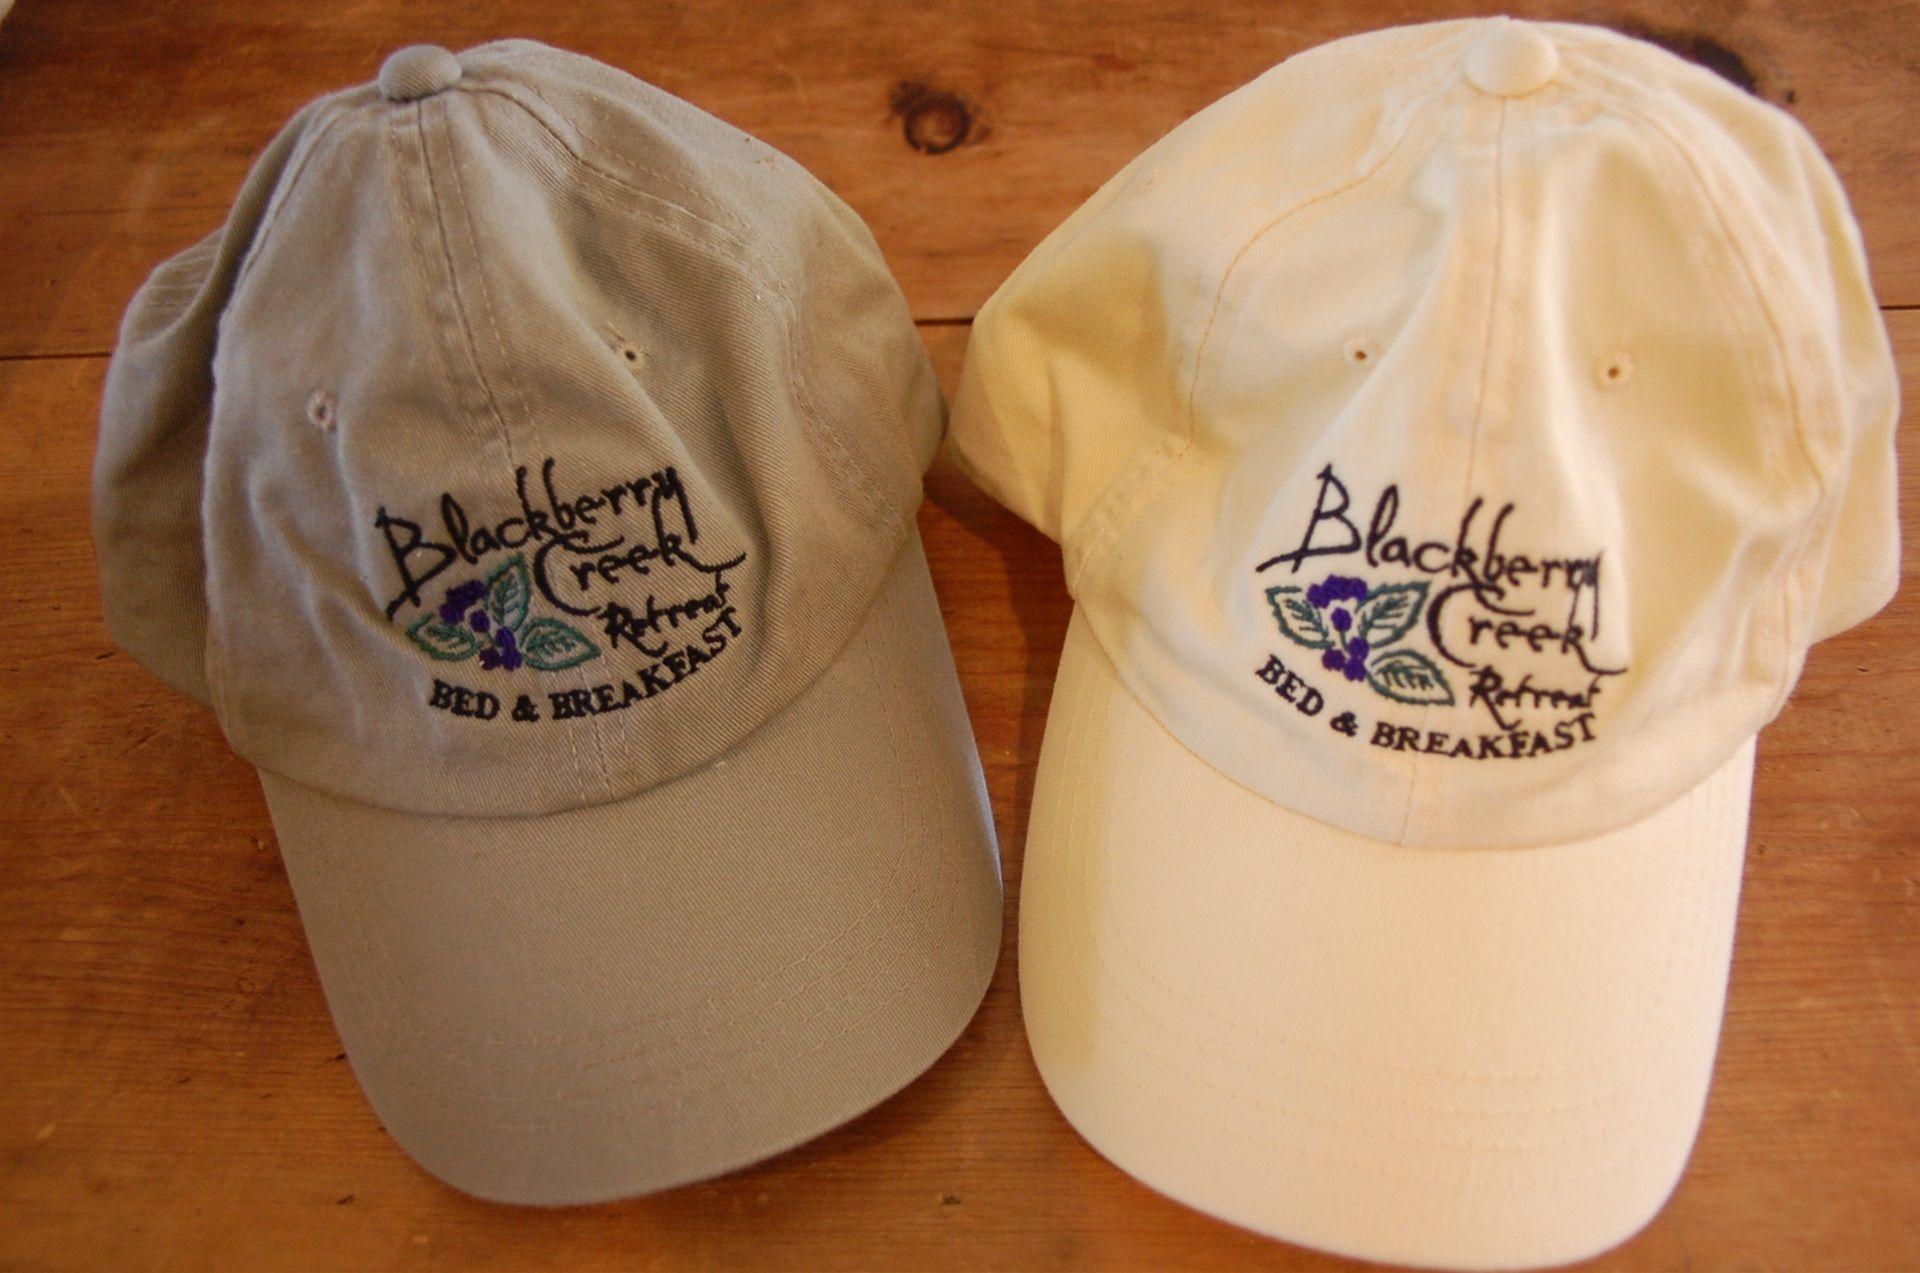 official Blackberry Creek Bed & Breakfast merchandise